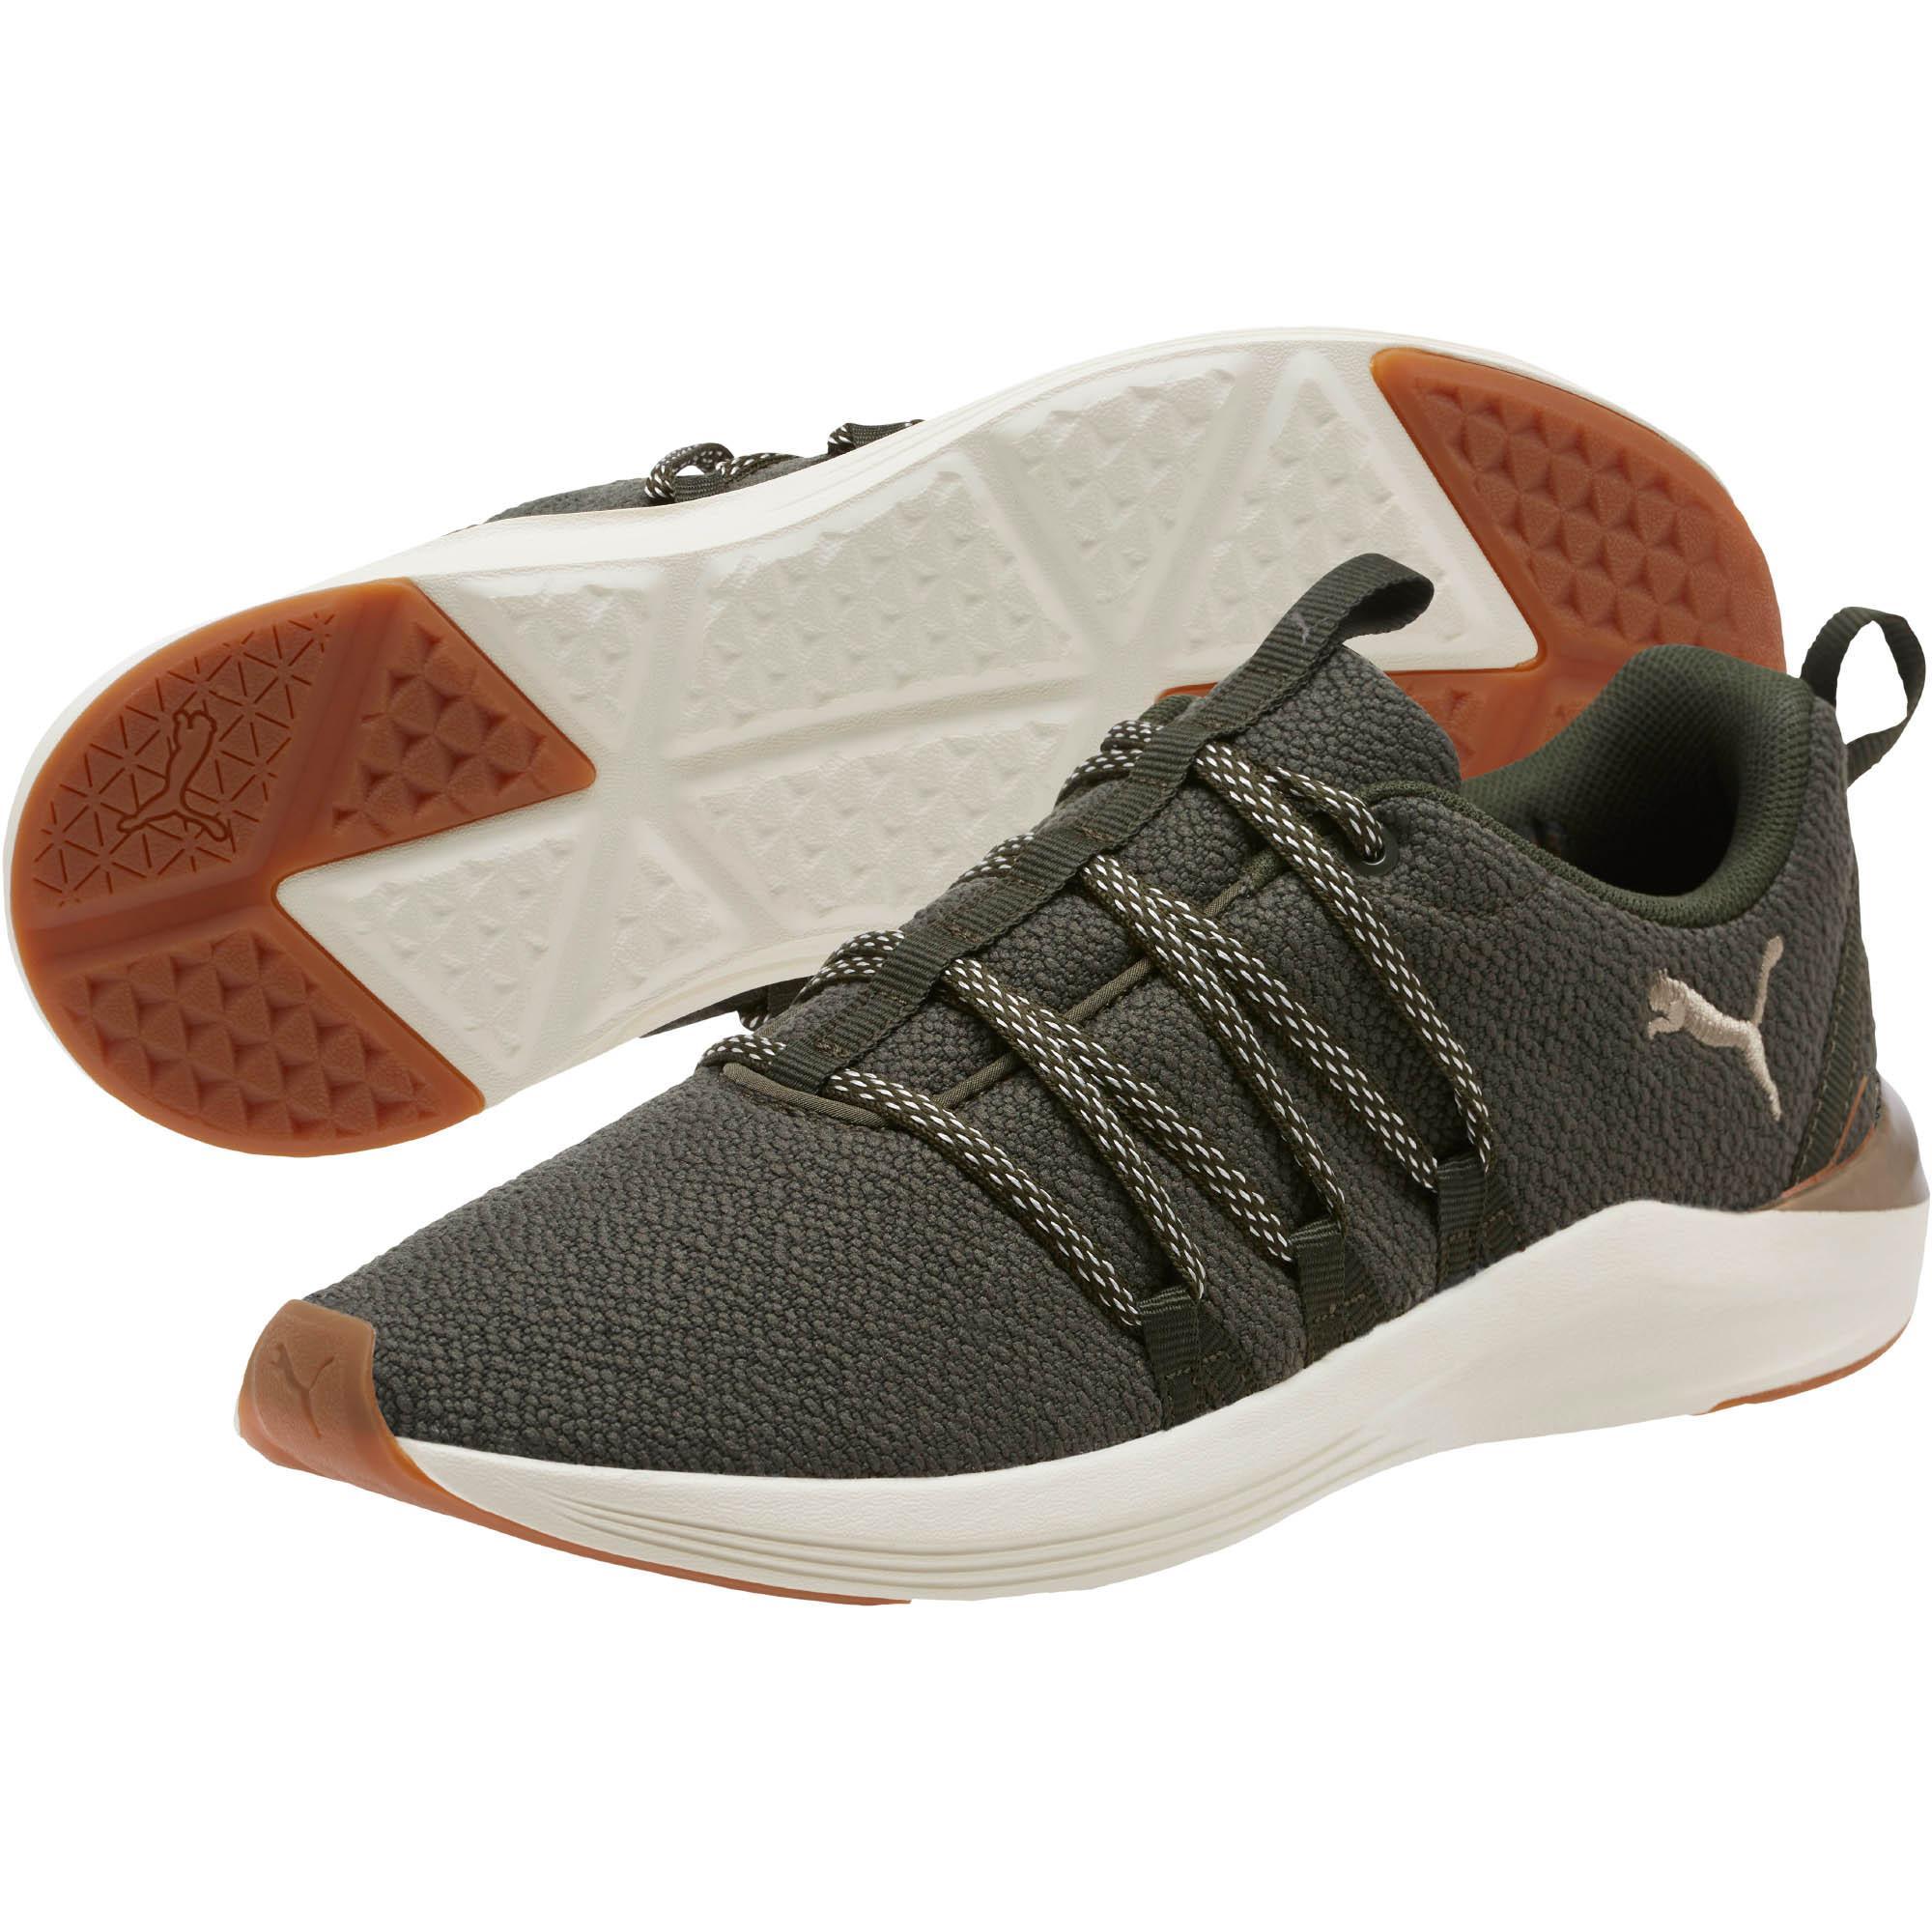 b7f2a4073a70 PUMA - Multicolor Prowl Alt Prem Mesh Women s Sneakers for Men - Lyst. View  fullscreen